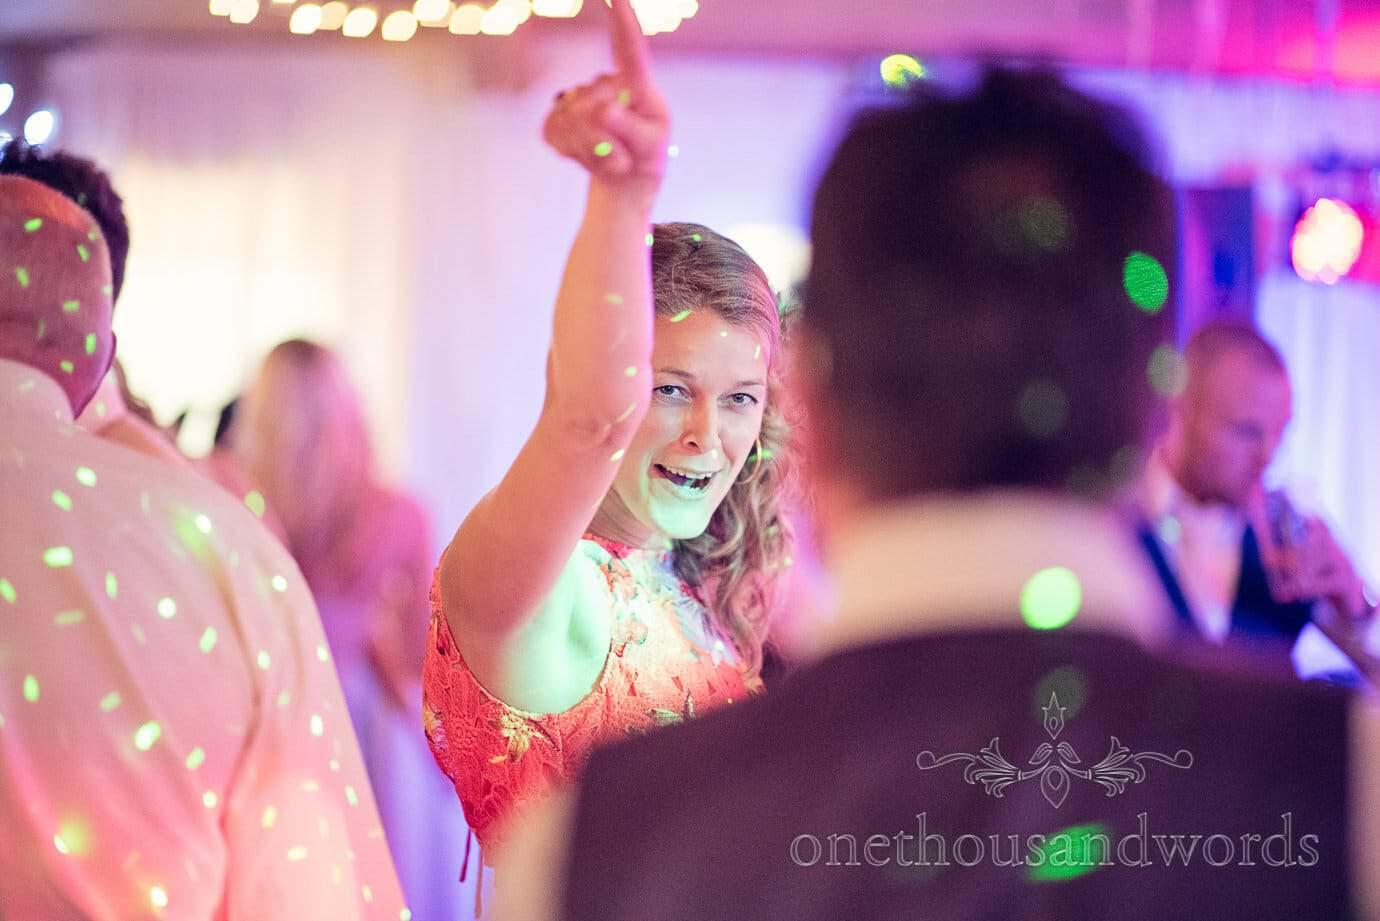 Wedding guest dancing in disco lights at Wareham Rugby Club wedding